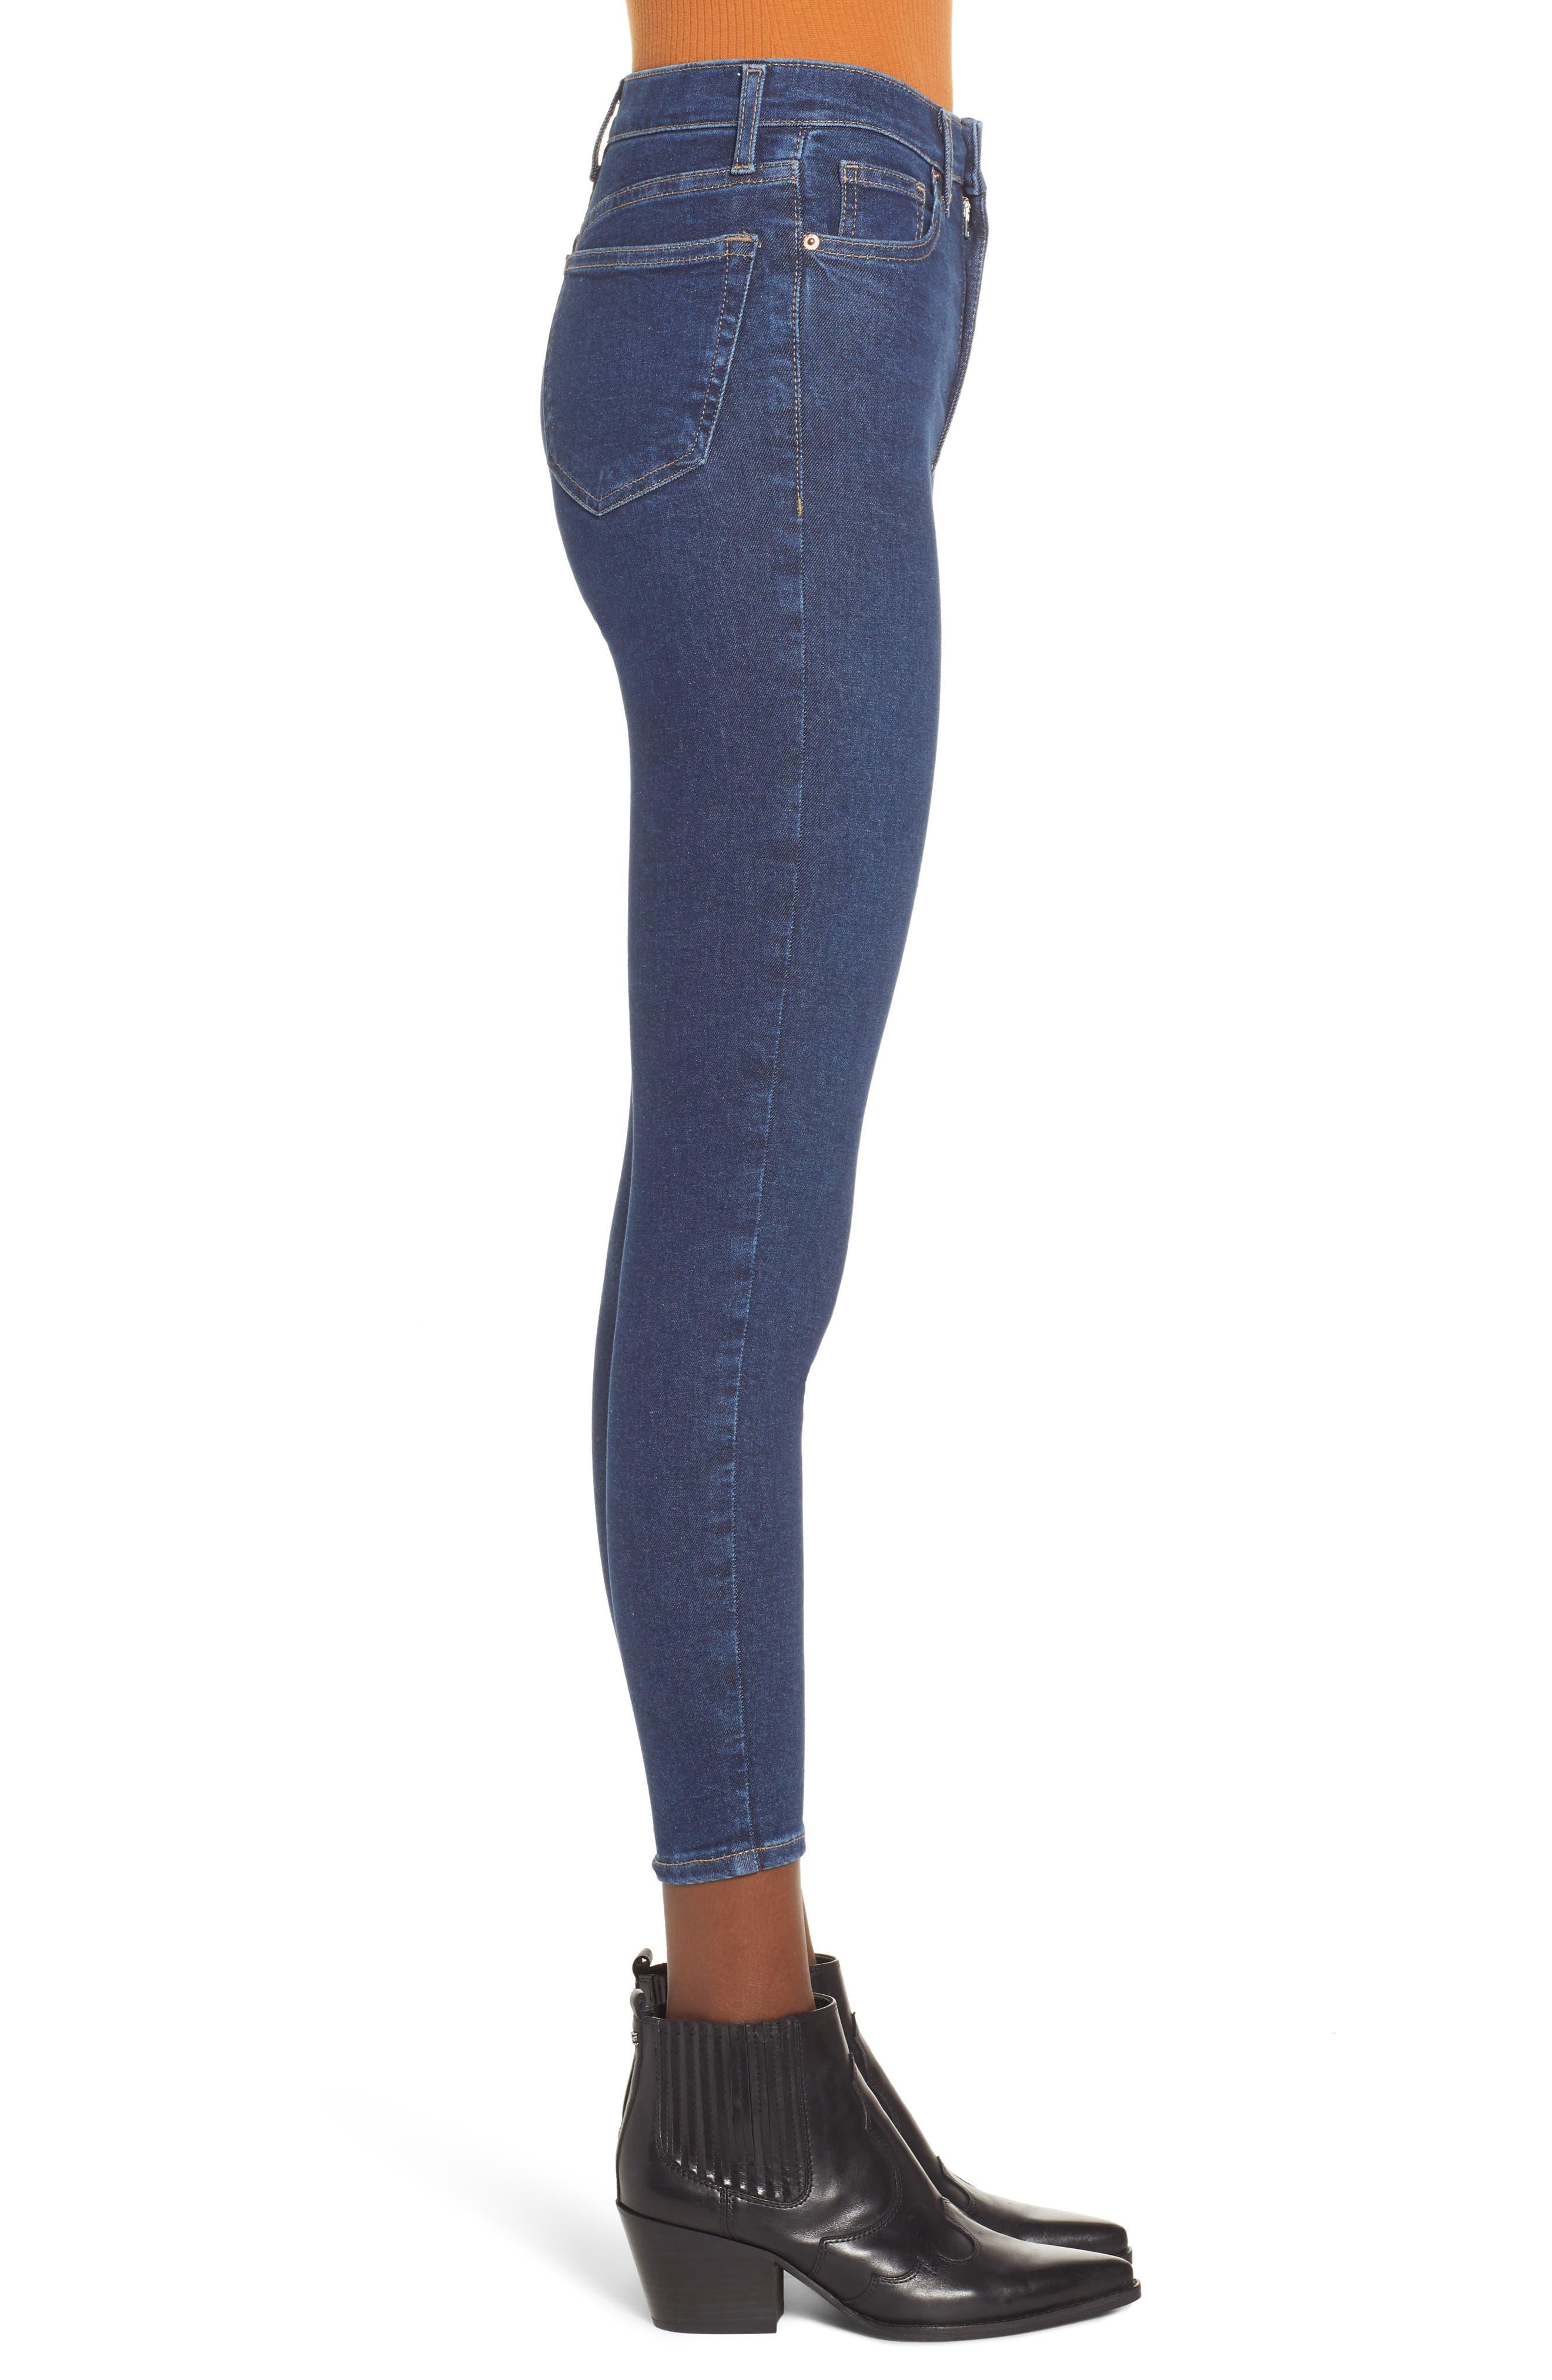 TOPSHOP, MOTO Jamie High Waist Skinny Jeans, Alternate thumbnail 4, color, INDIGO